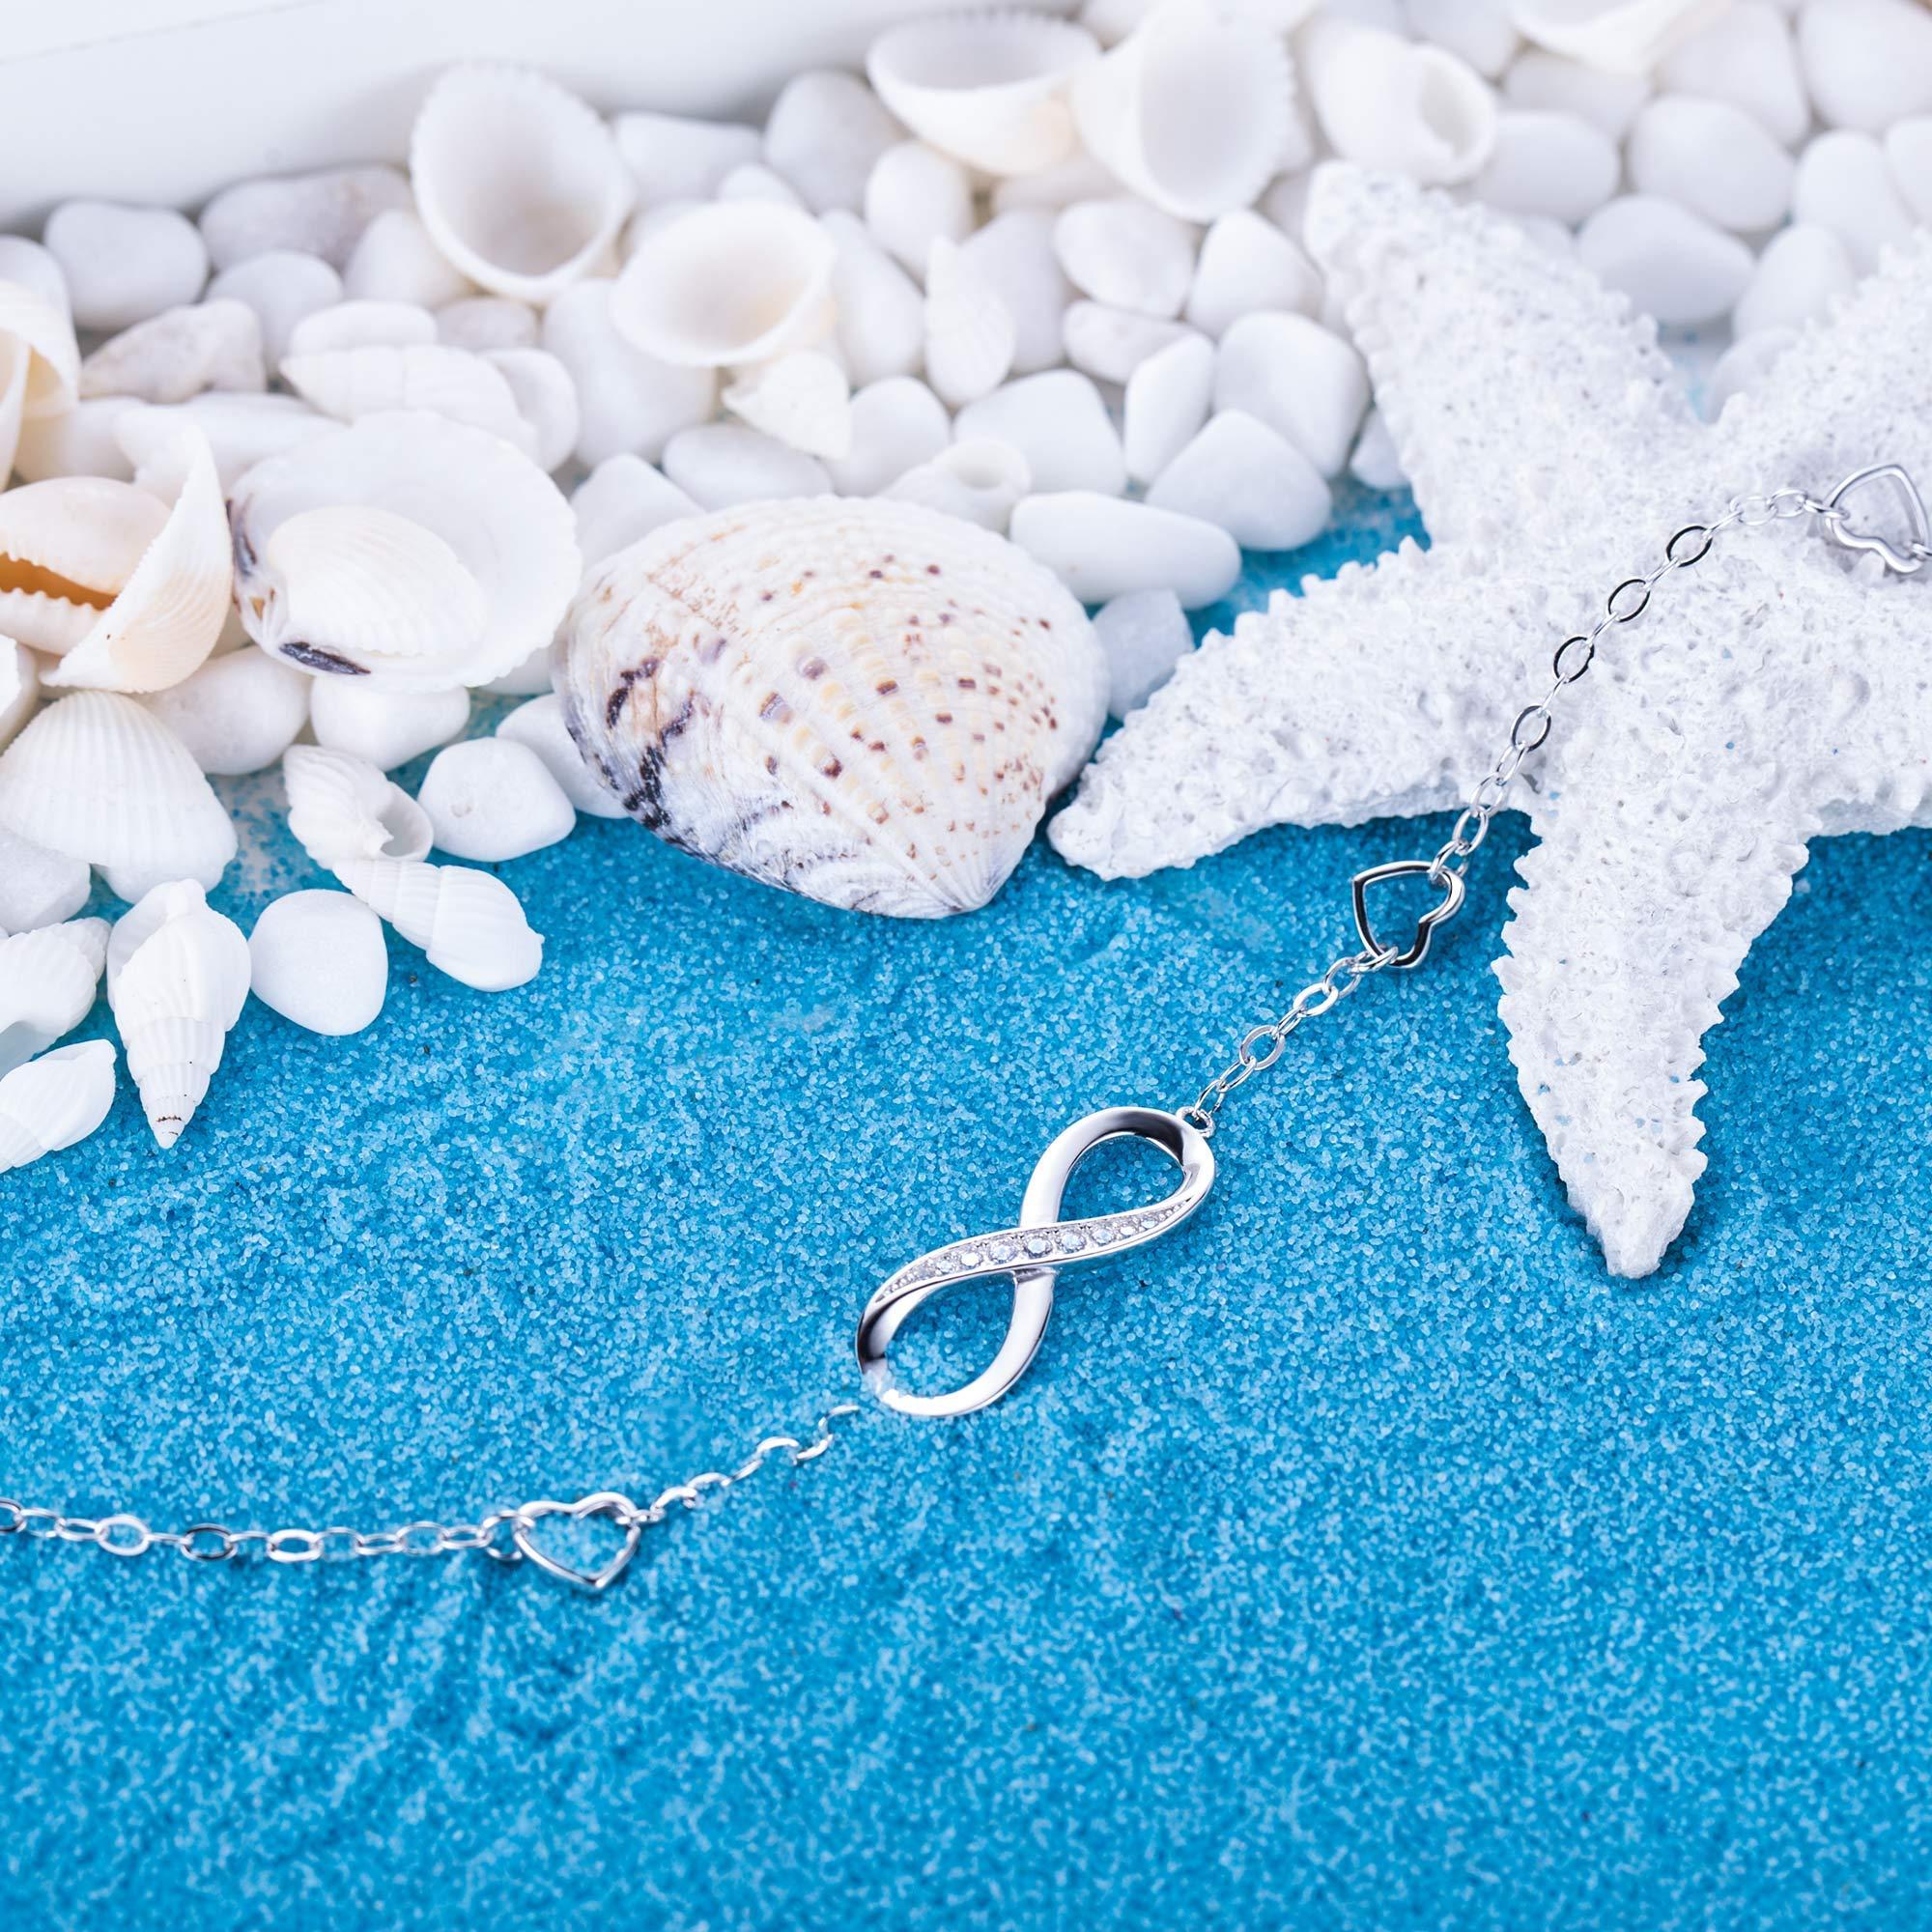 Billie Bijoux Womens 925 Sterling Silver Infinity Endless Love Symbol Charm Adjustable Anklet Bracelet, Large Bracelet, Gift for Mother's Day (A- Silver) by Billie Bijoux (Image #6)